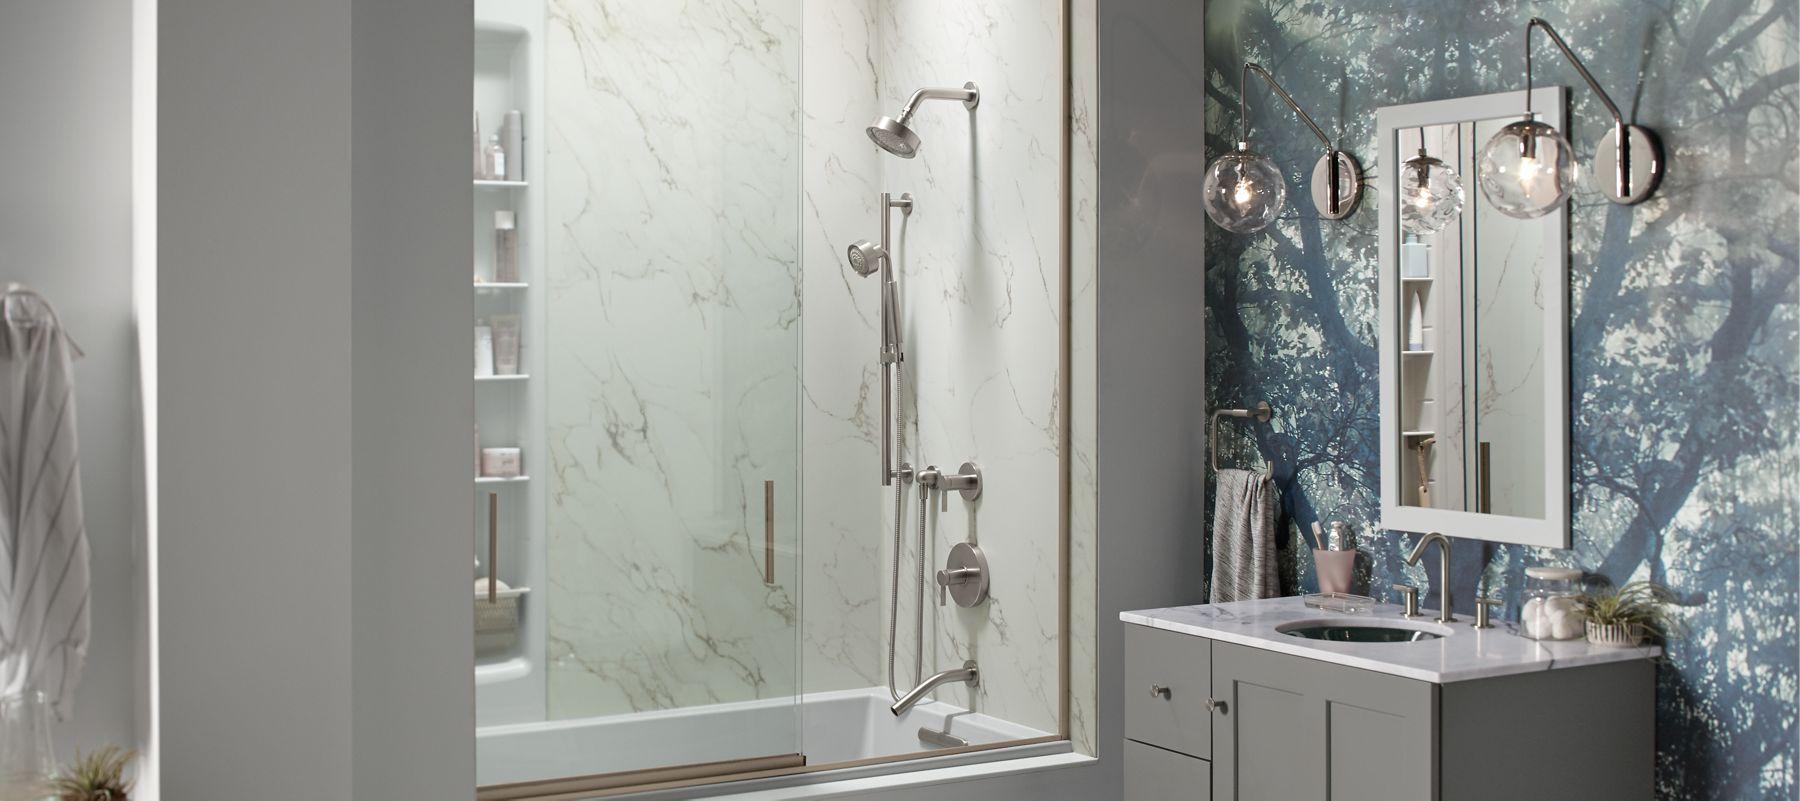 kohler bathroom design service kohler kohler bathroom cabinets bathroom shower tub tile ideas